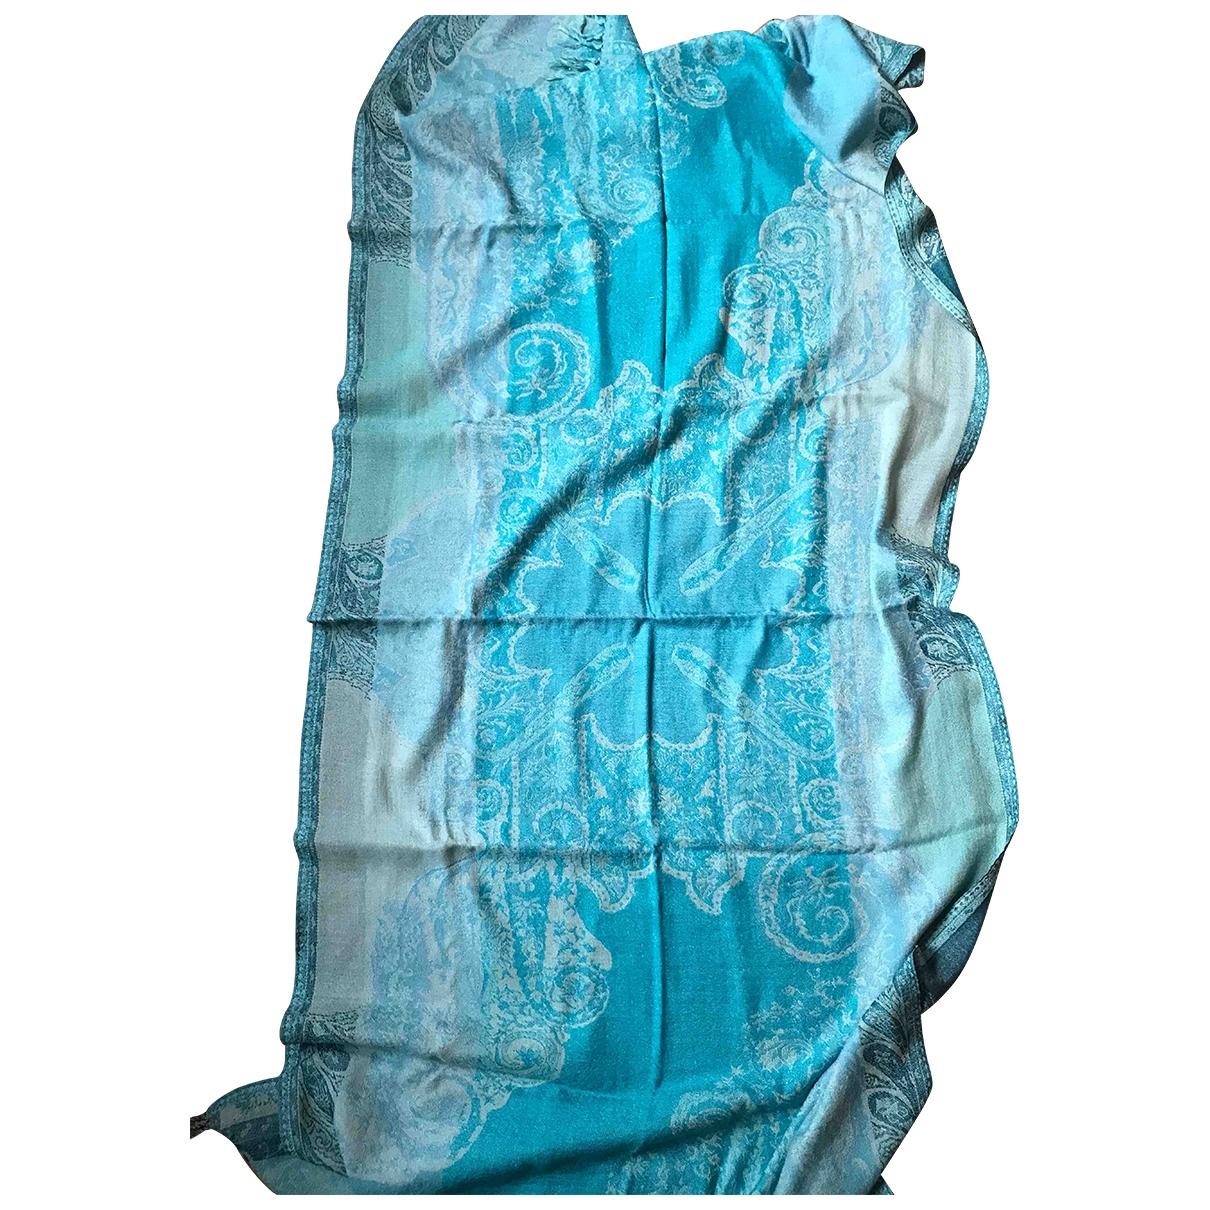 Blumarine \N Turquoise Wool scarf for Women \N